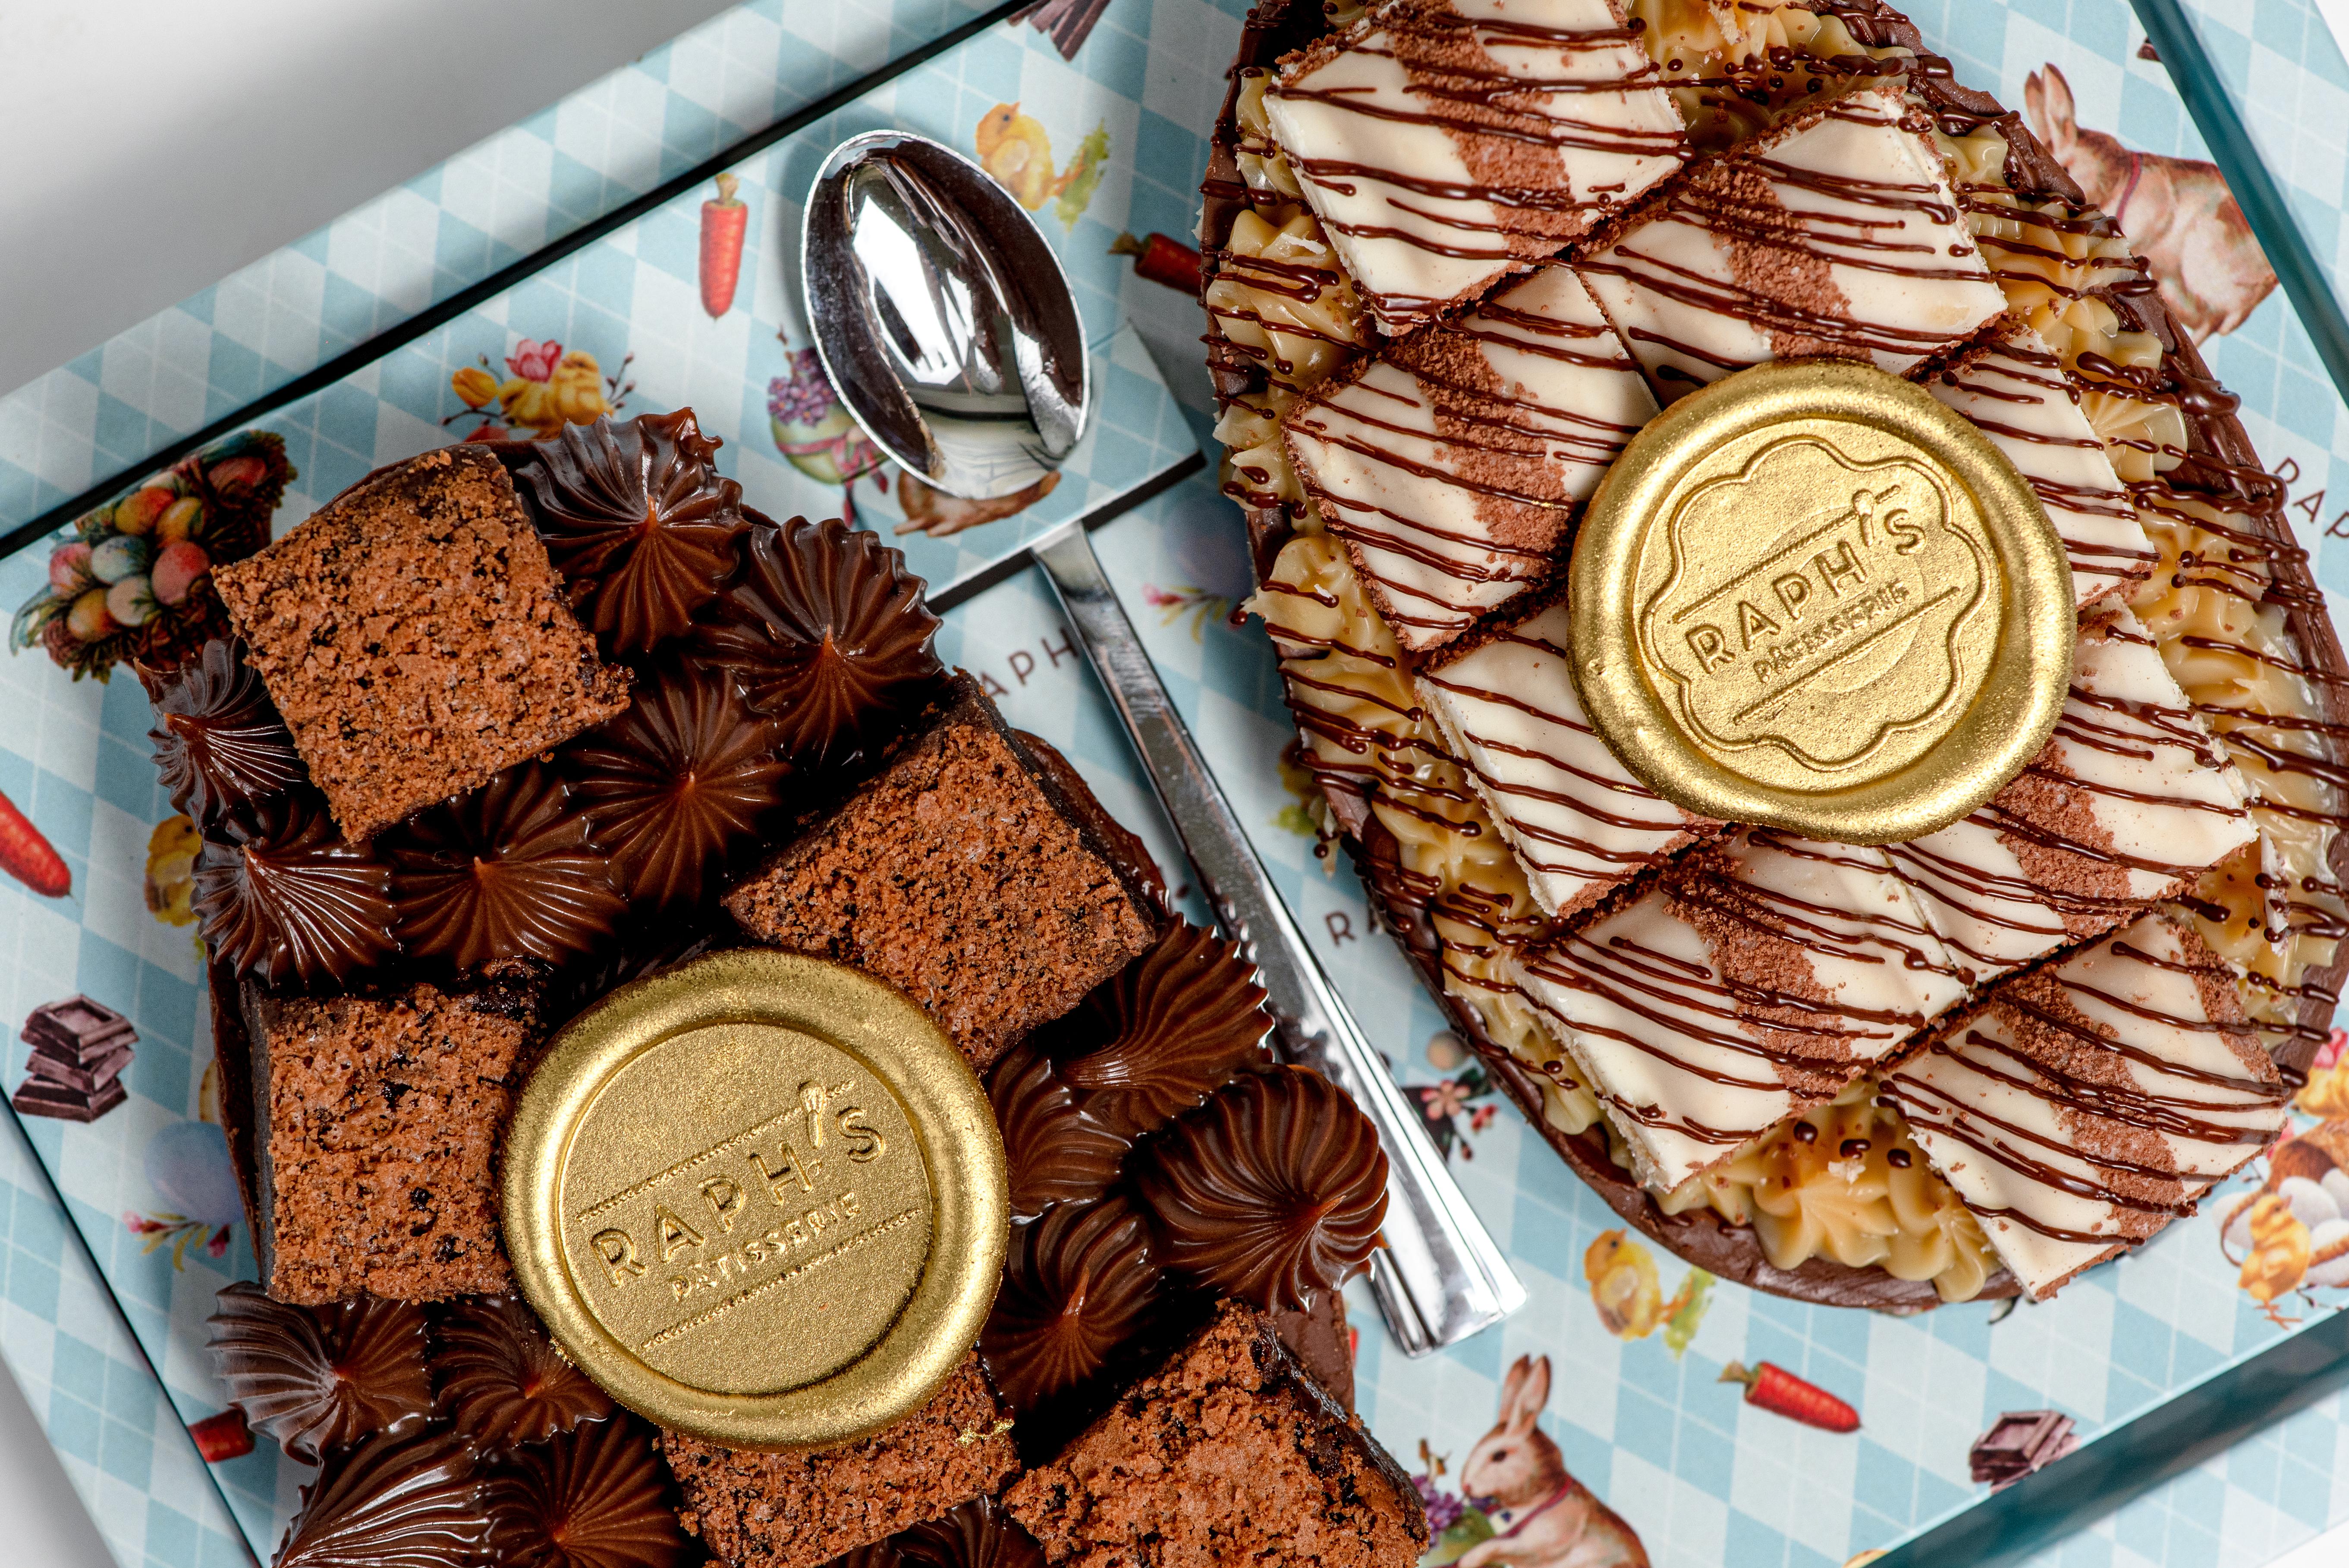 Raph's Pâtisserie: gostosuras em dose dupla